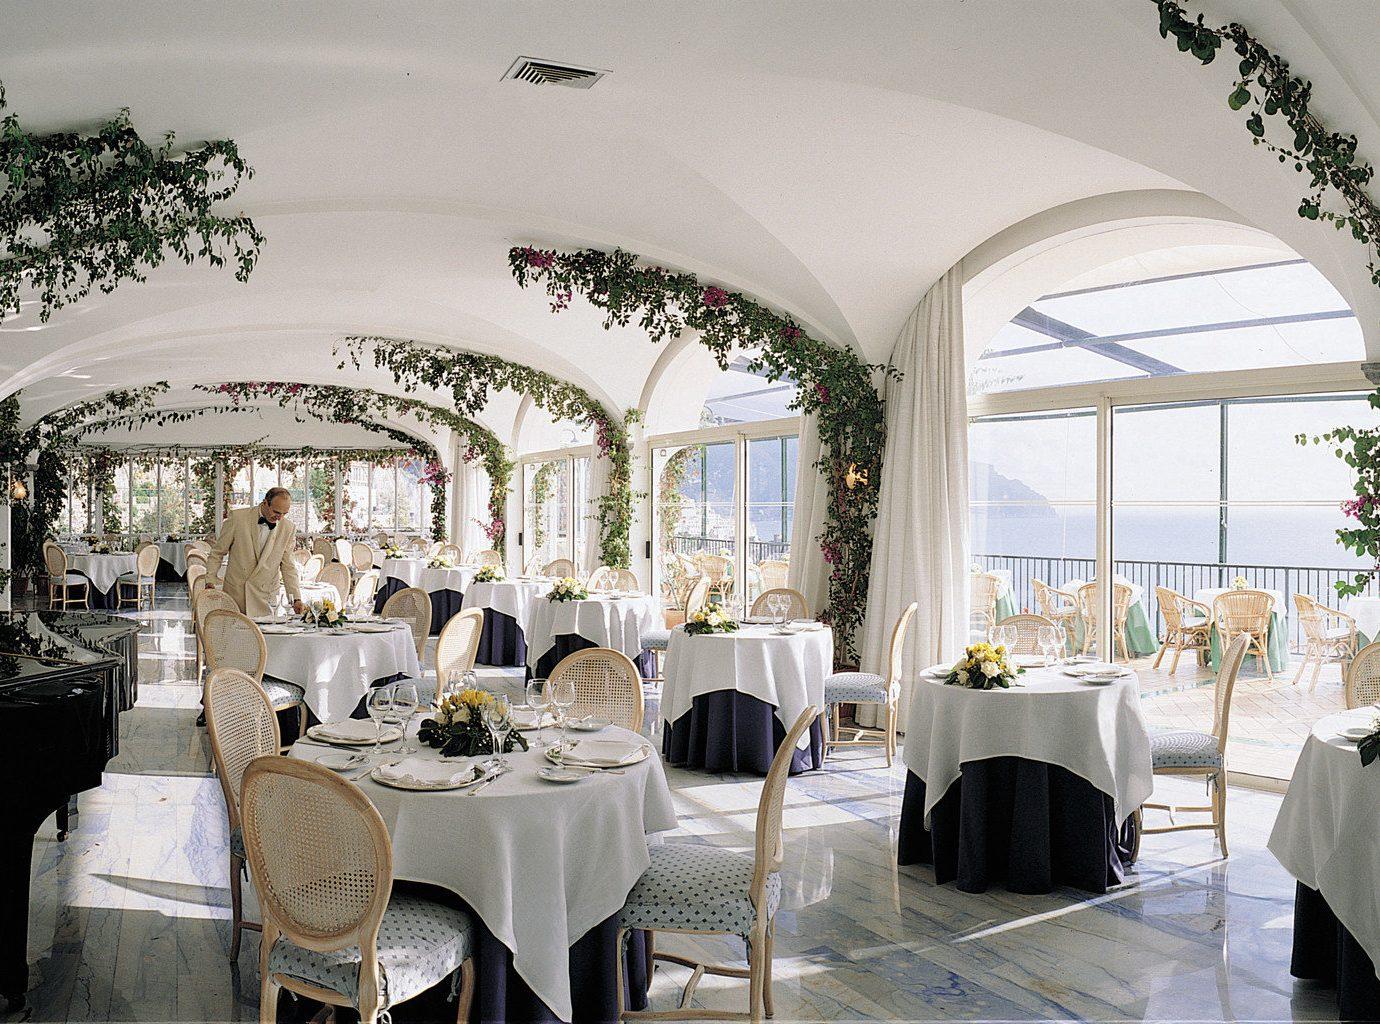 Restaurant at Hotel Santa Caterina, Amalfi